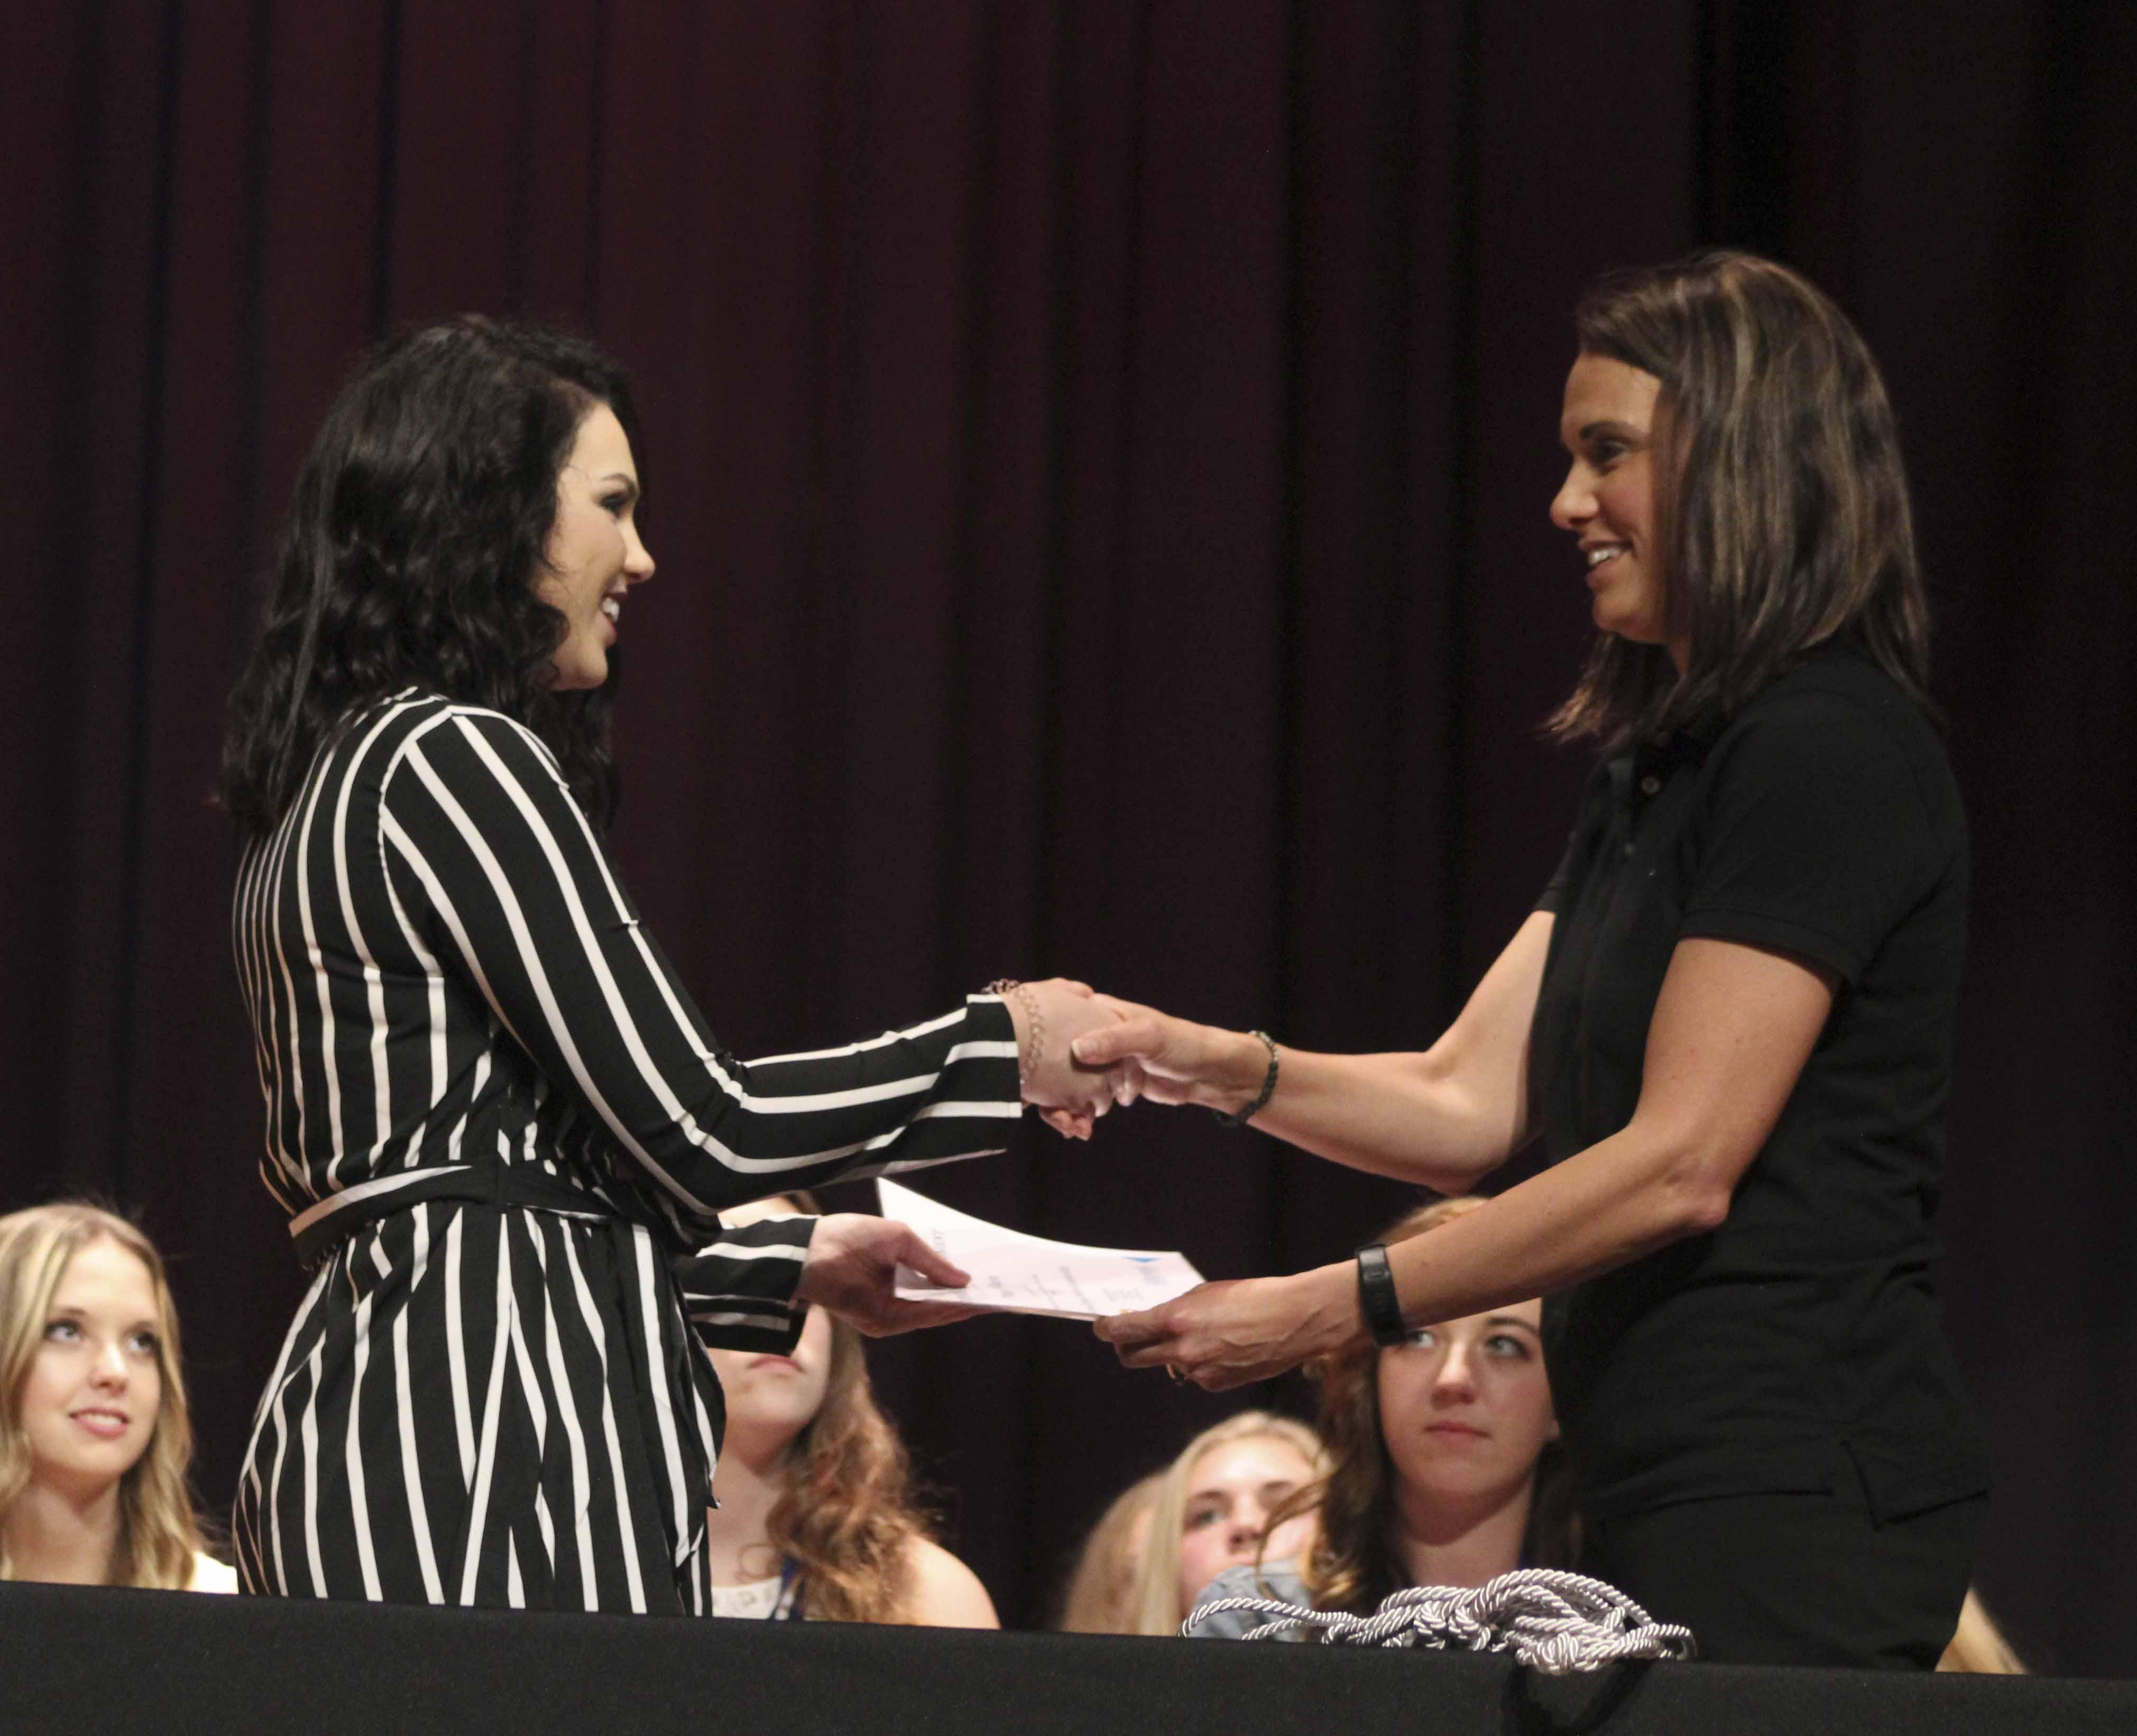 Paige Folken (left) receives a scholarship certificate from Julie Welter of the Jones Regional Education Center (Kirkwood).